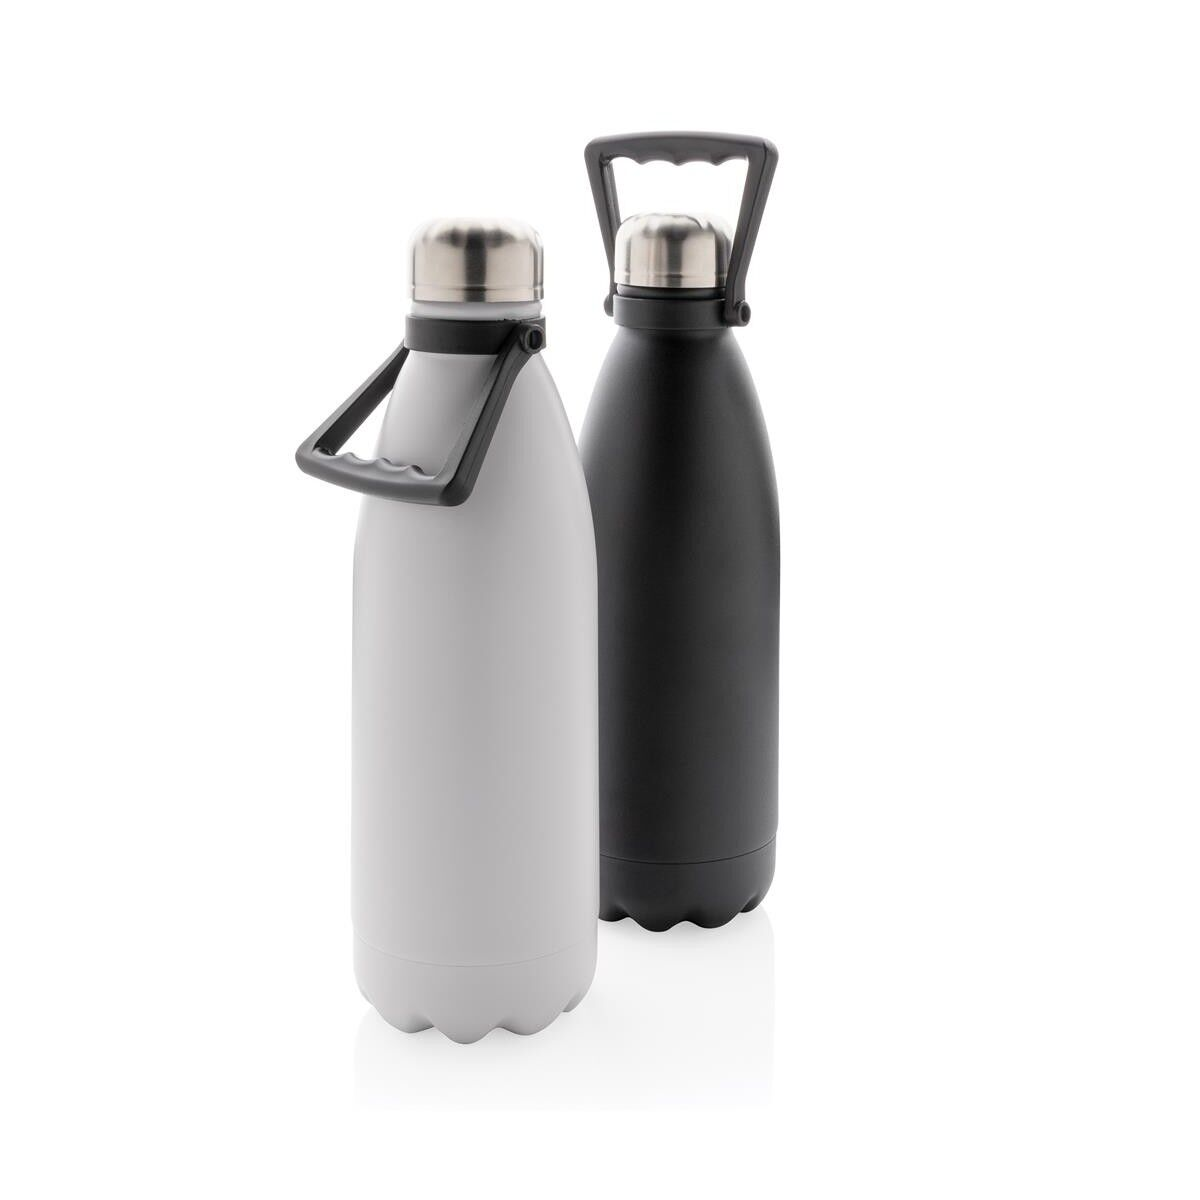 Large Stainless Steel Bottle - White